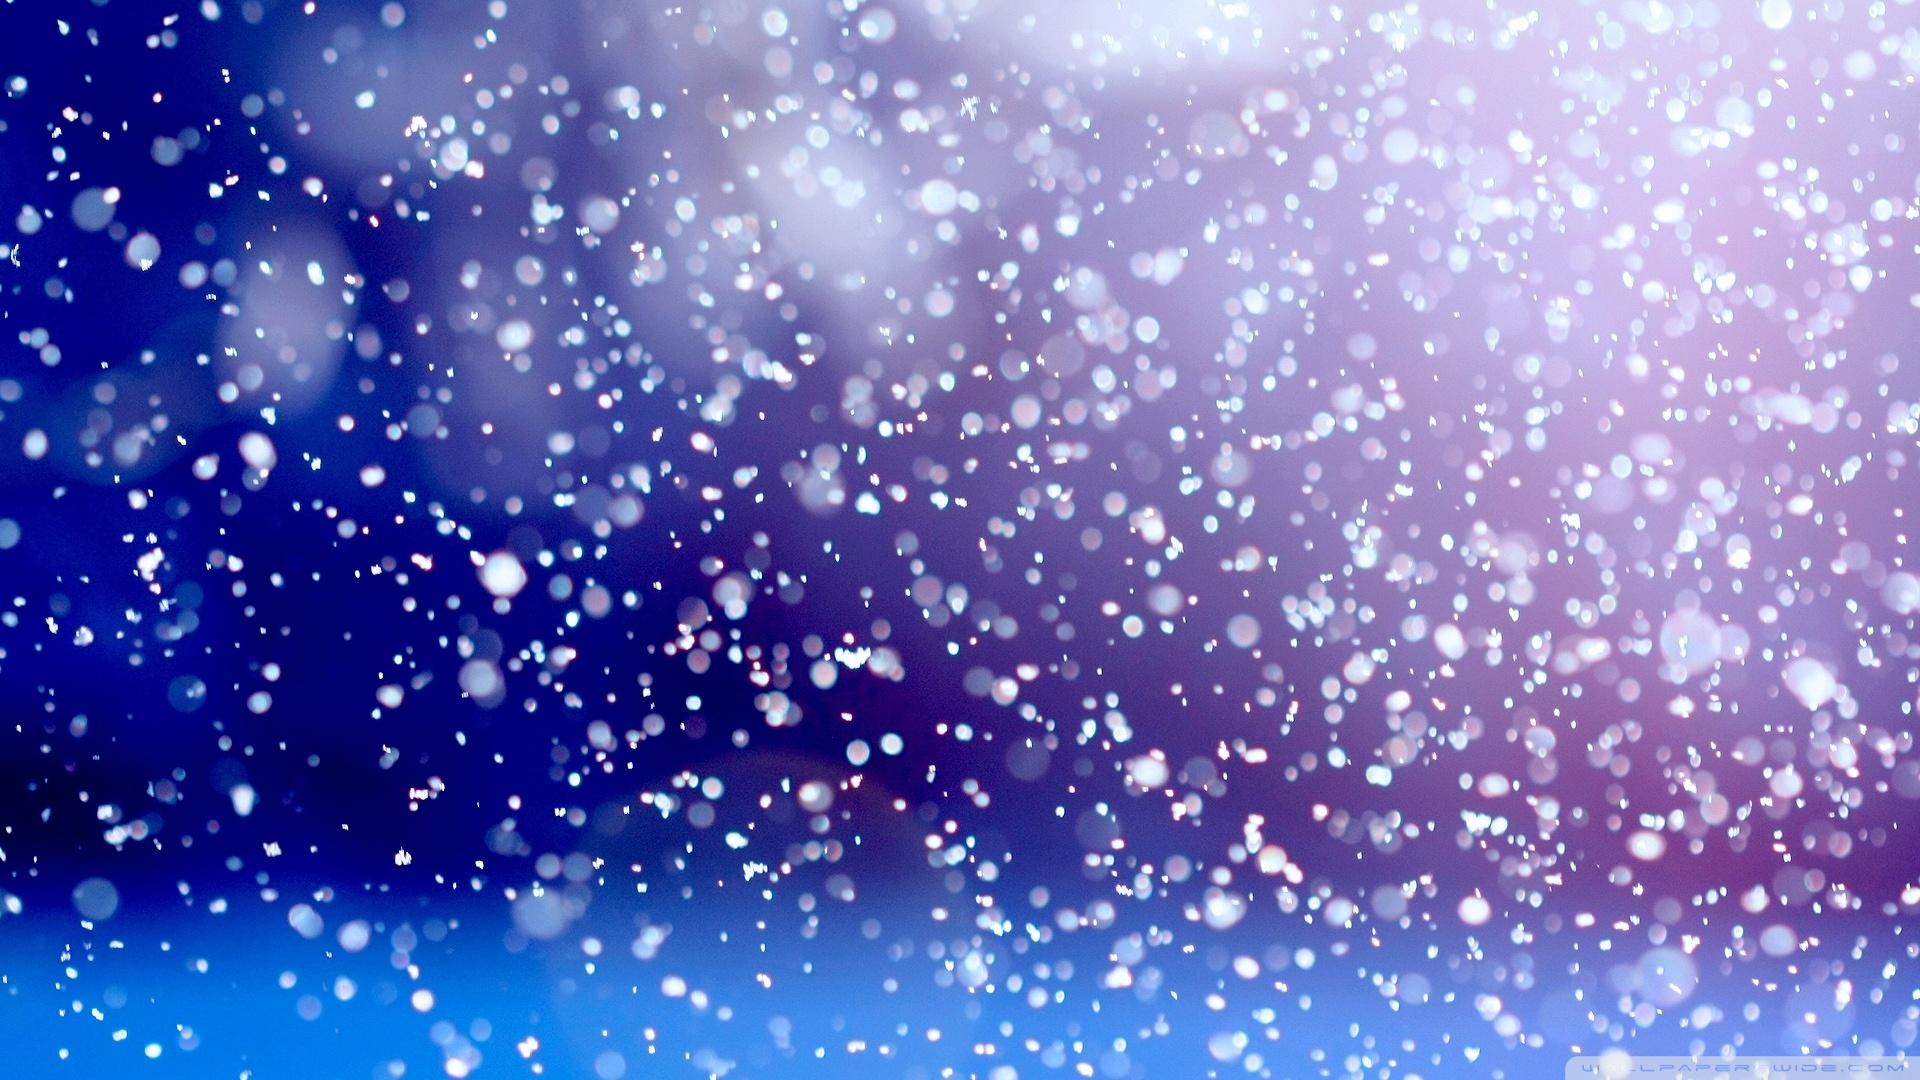 Snowflakes Falling Wallpaper 1920x1080 Snowflakes Falling 1920x1080